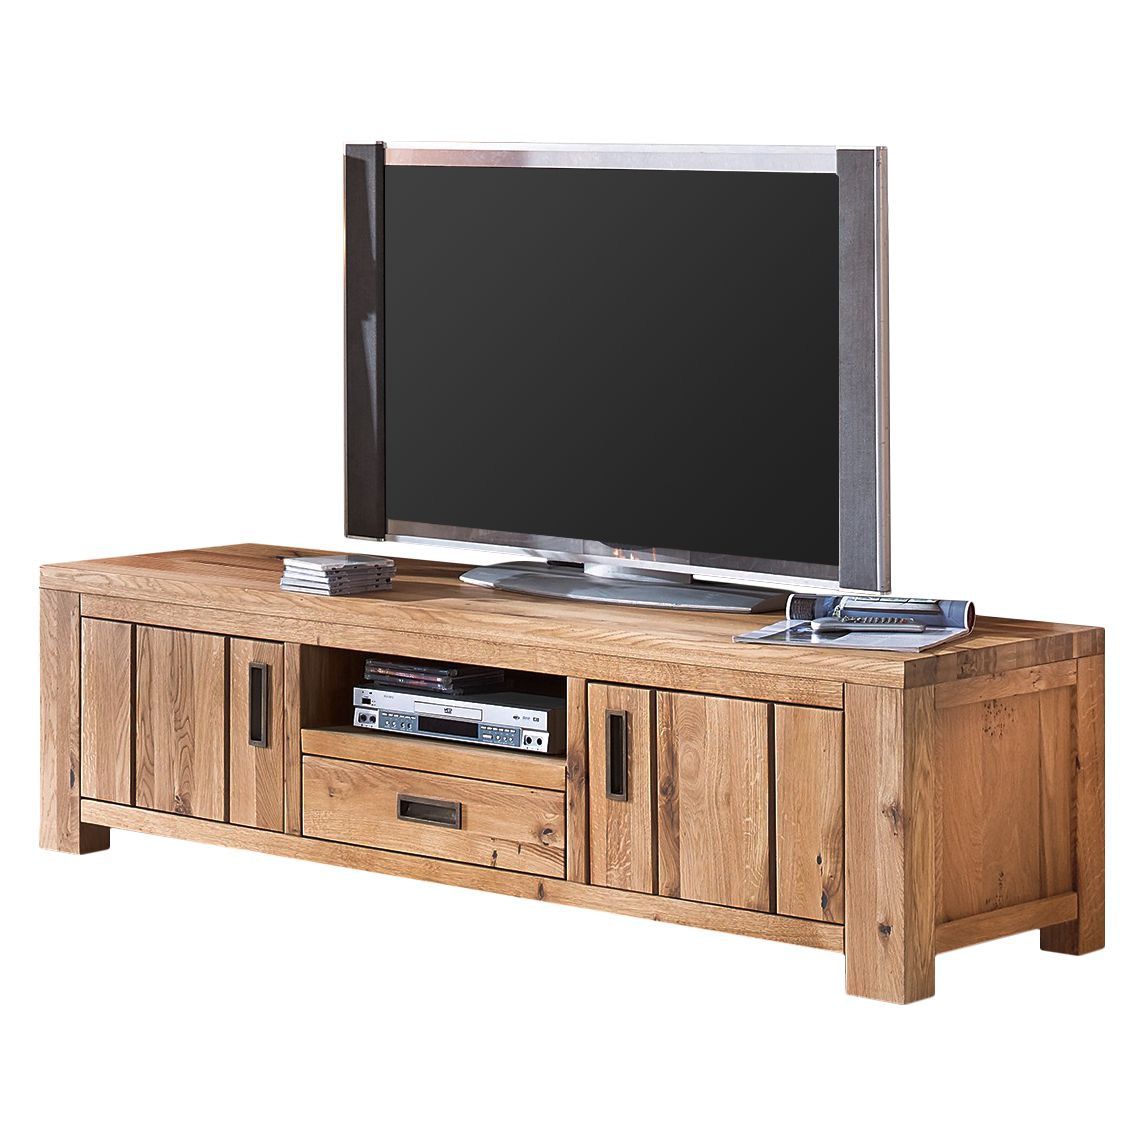 Meuble TV Lessebo - Chêne sauvage massif, Ars Natura